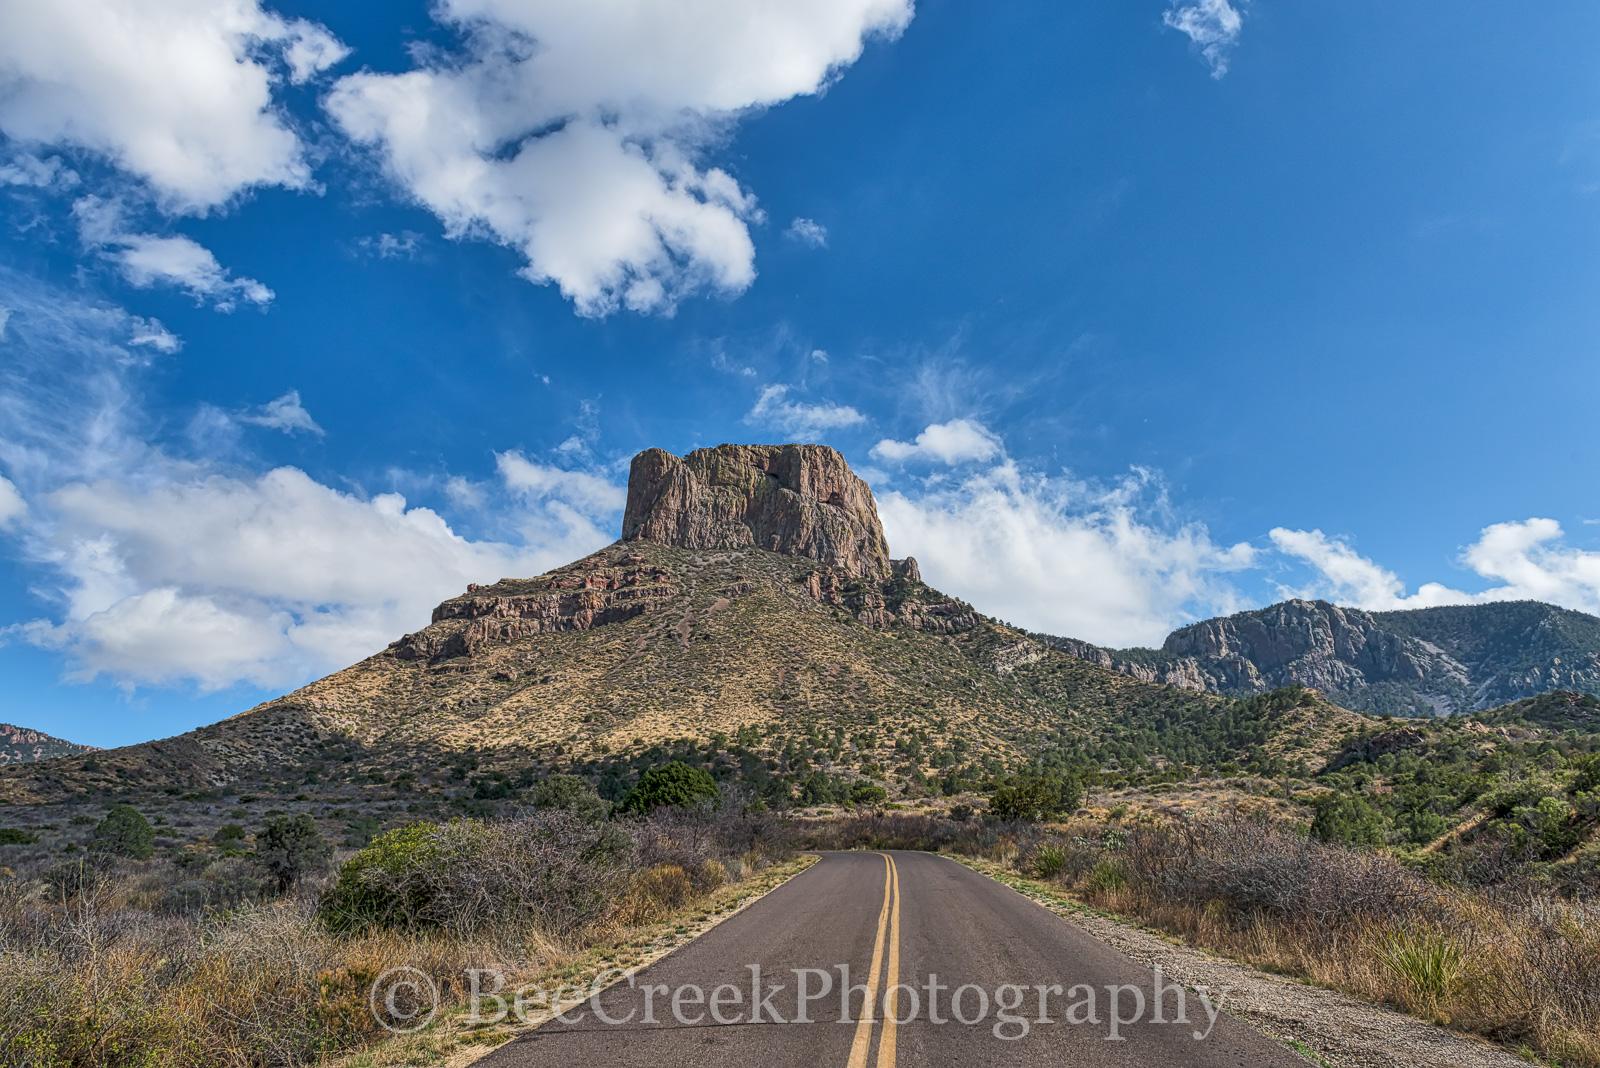 Big Bend National Park, Casa Grande Peak, Chiso mountains, Mountains, Road, blue skies, clouds, landscape, photo